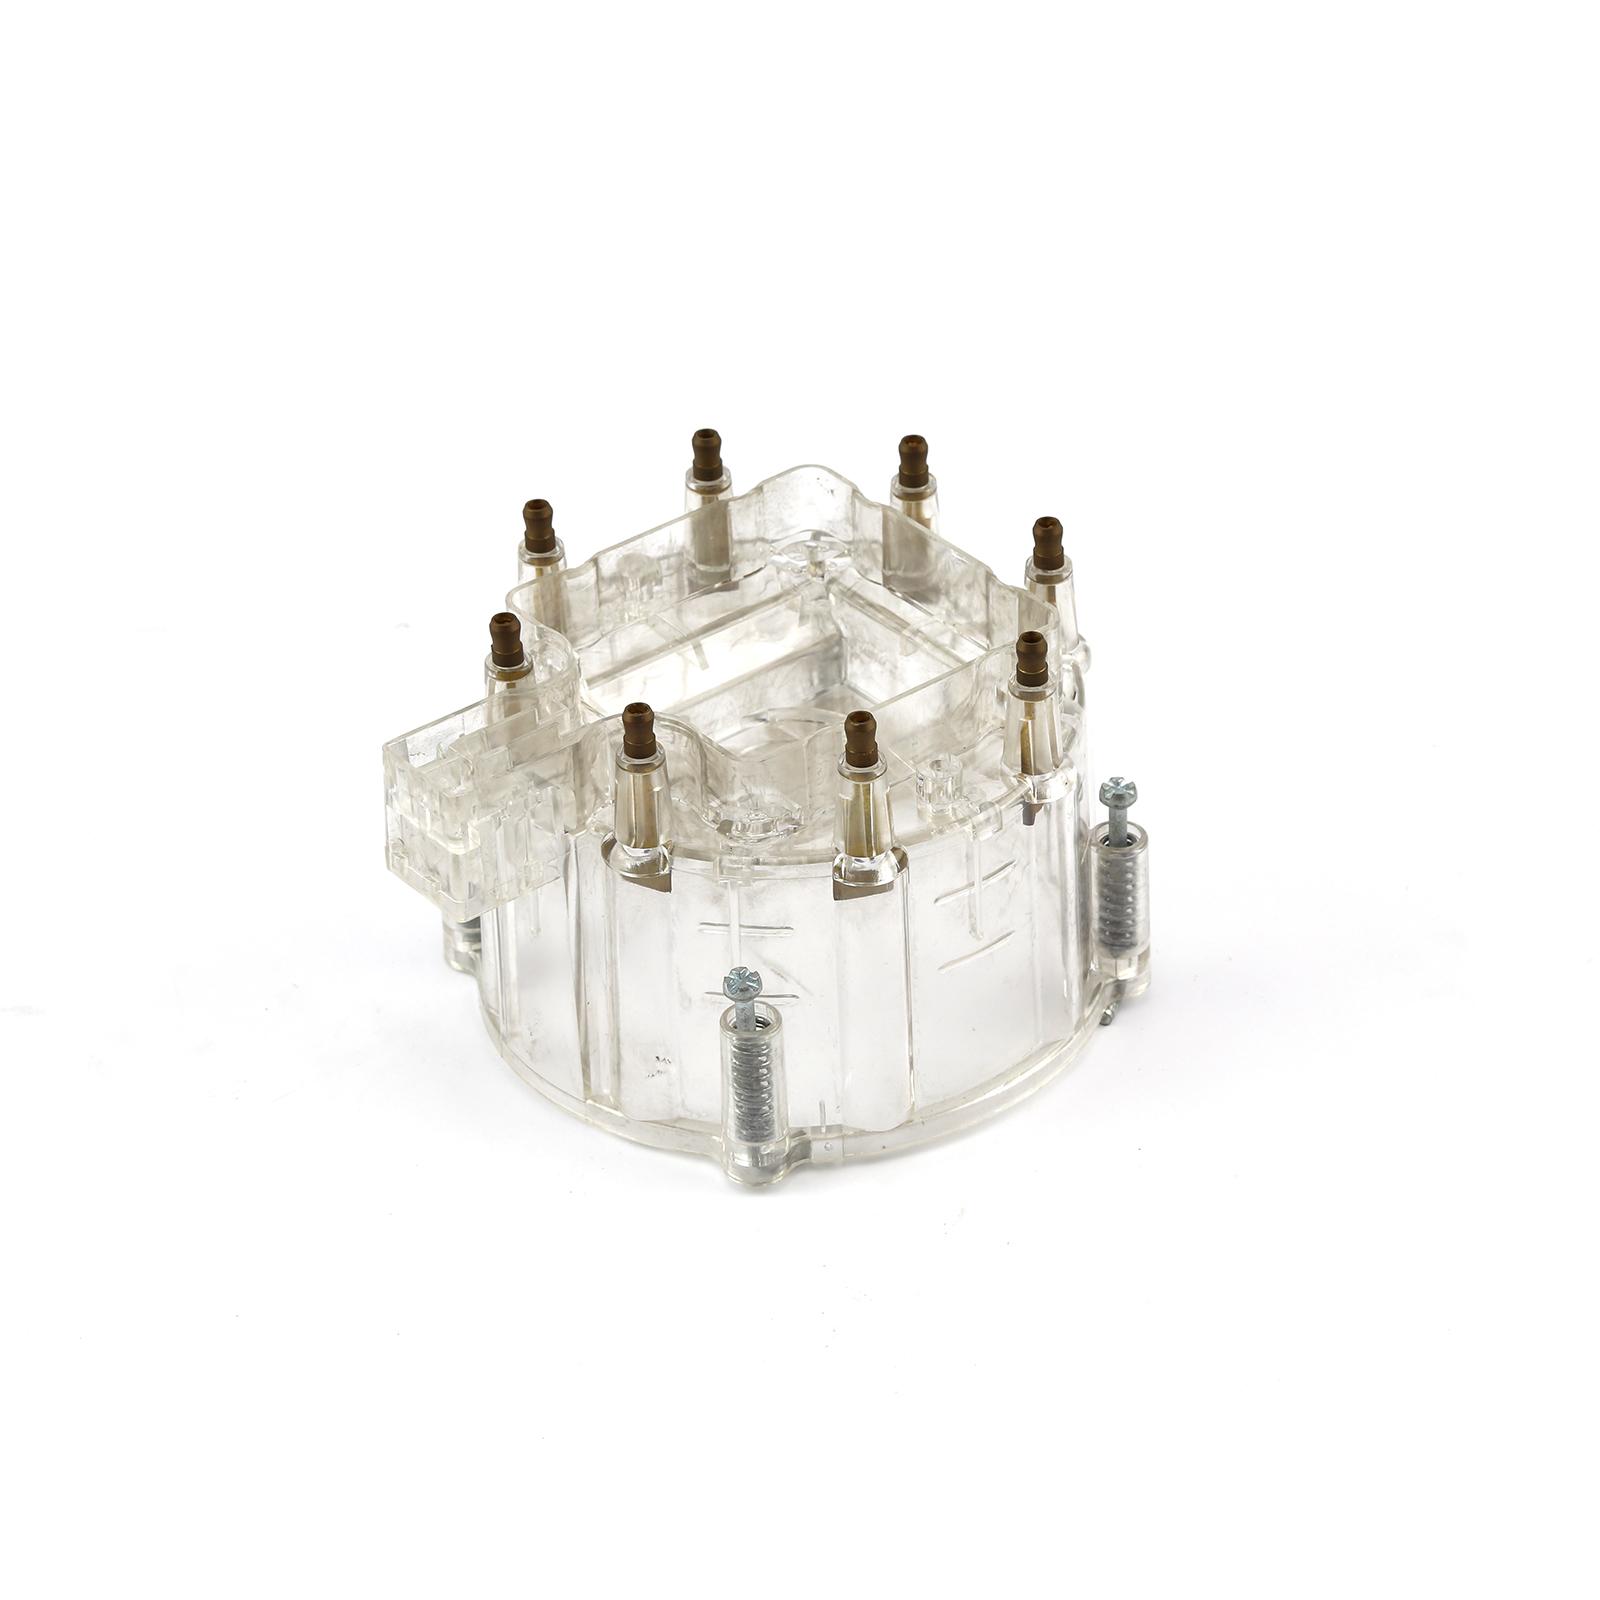 HEI Replacement Distributor Cap Brass Terminals - Clear